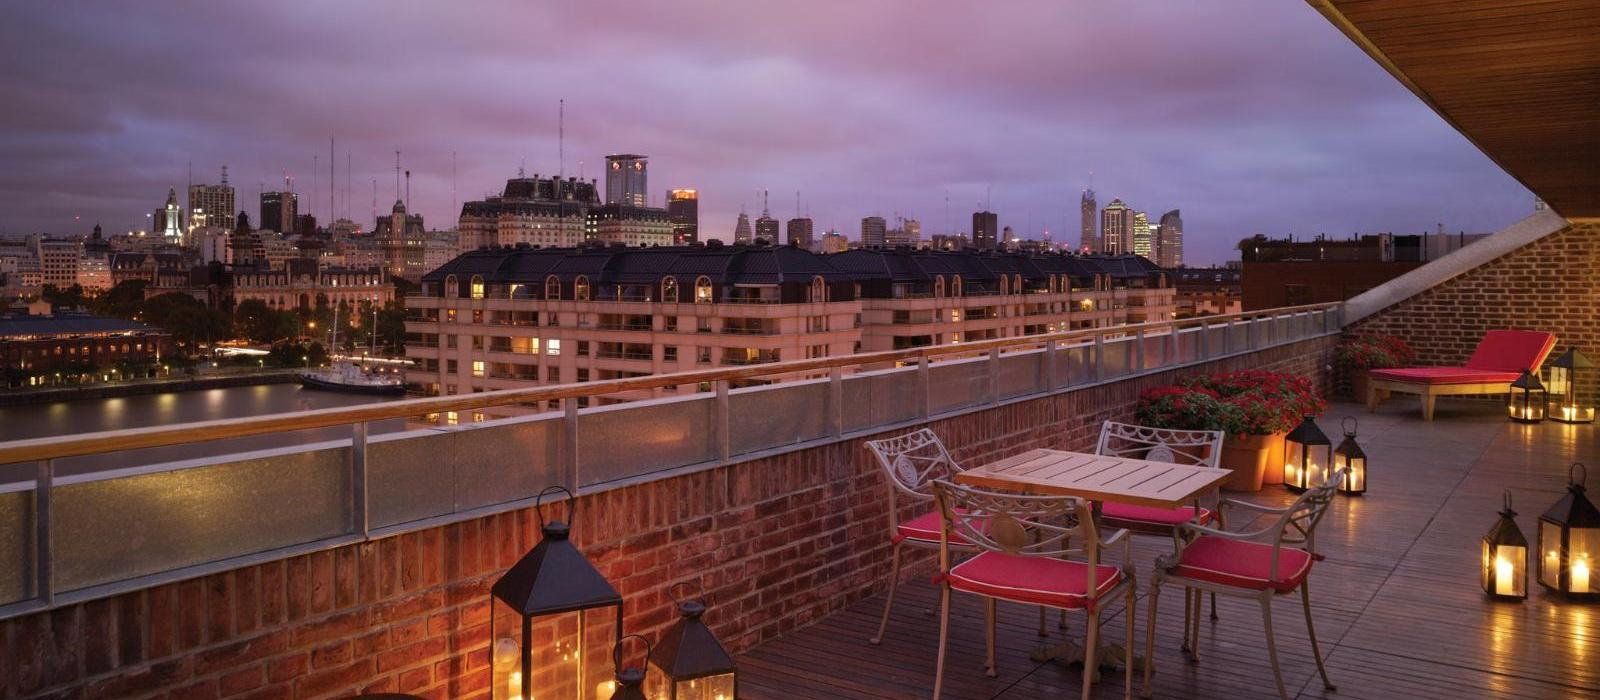 布宜诺斯艾利斯法恩纳酒店(Faena Hotel Buenos Aires) 图片  www.lhw.cn